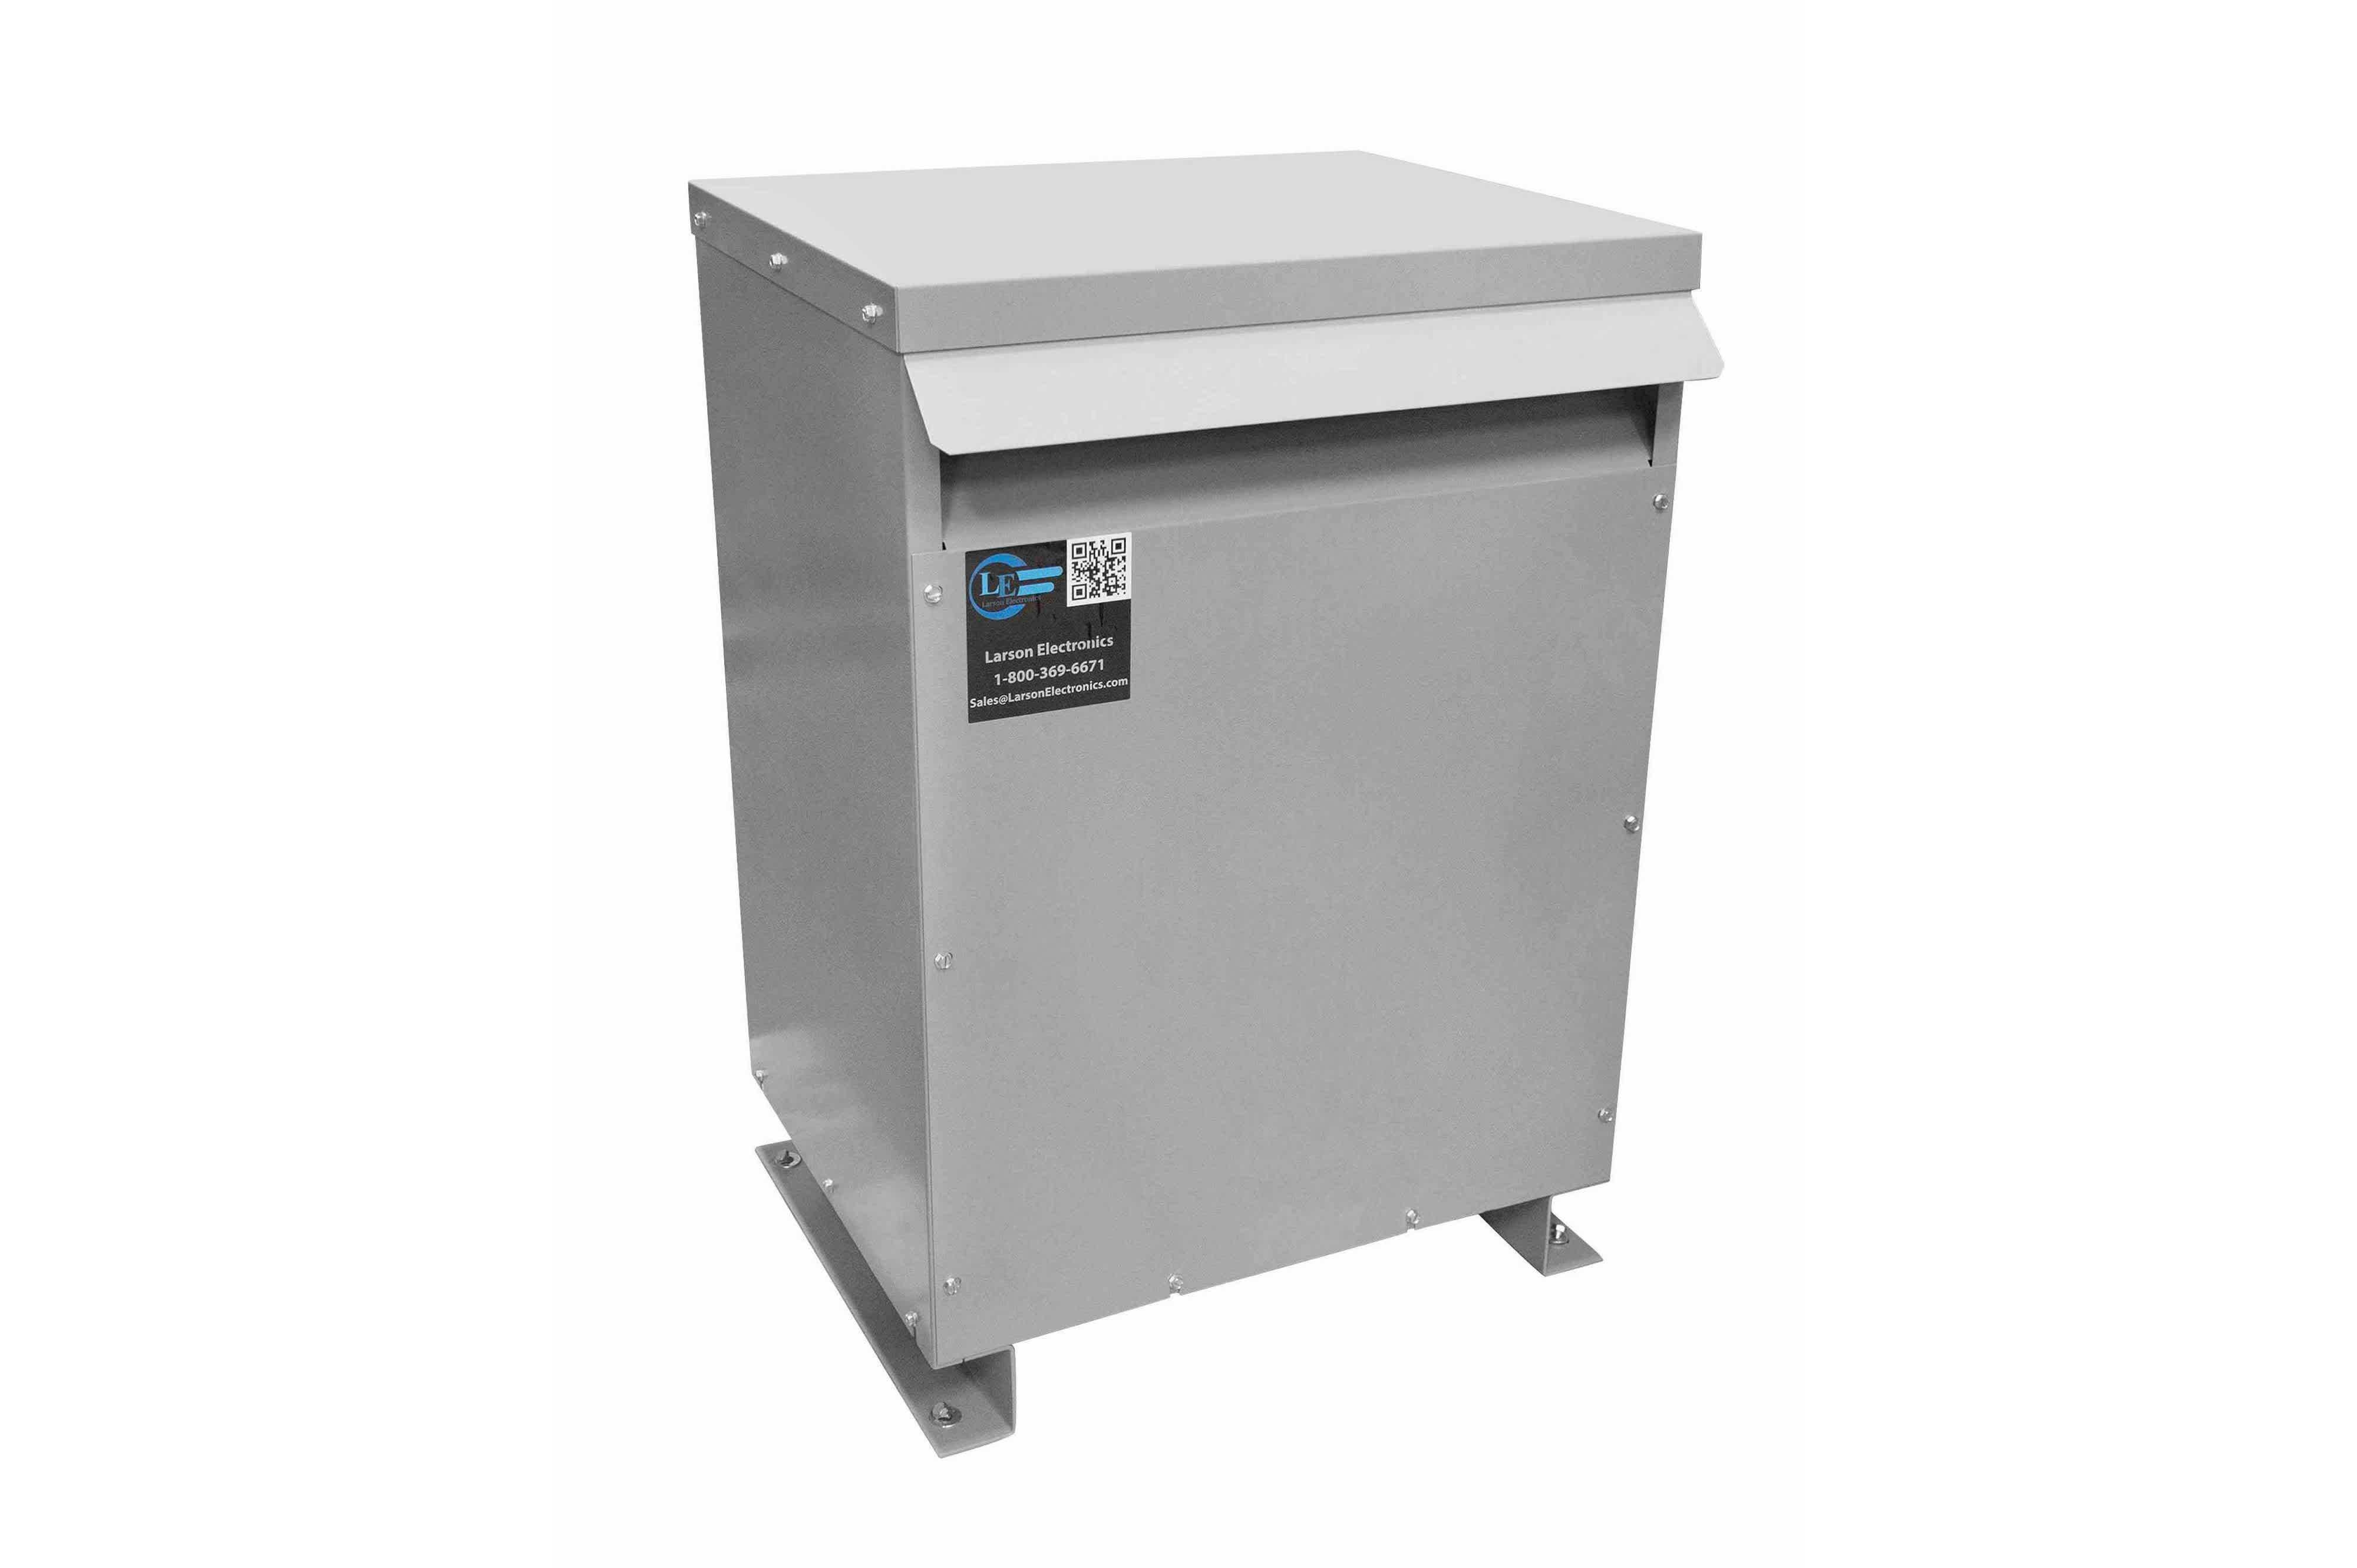 237.5 kVA 3PH Isolation Transformer, 480V Wye Primary, 400V Delta Secondary, N3R, Ventilated, 60 Hz